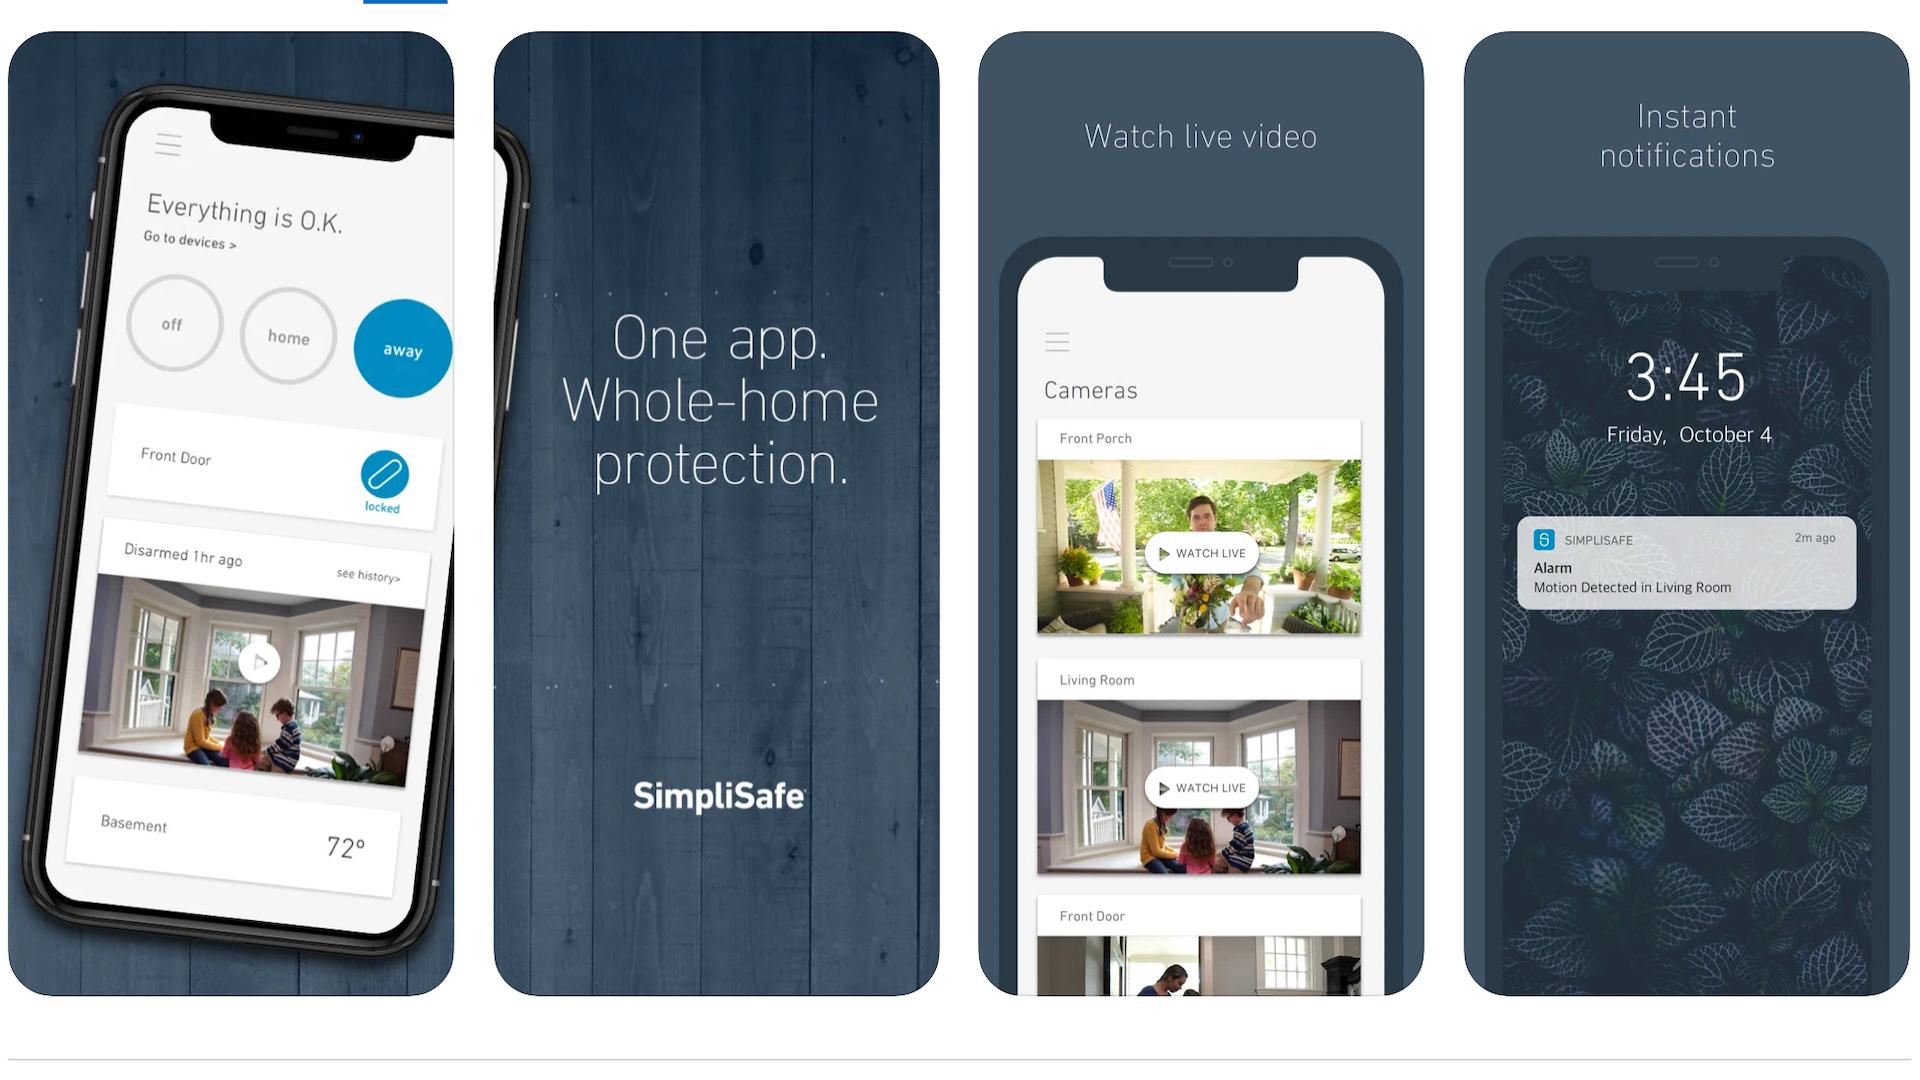 SimpliSafe iOS app